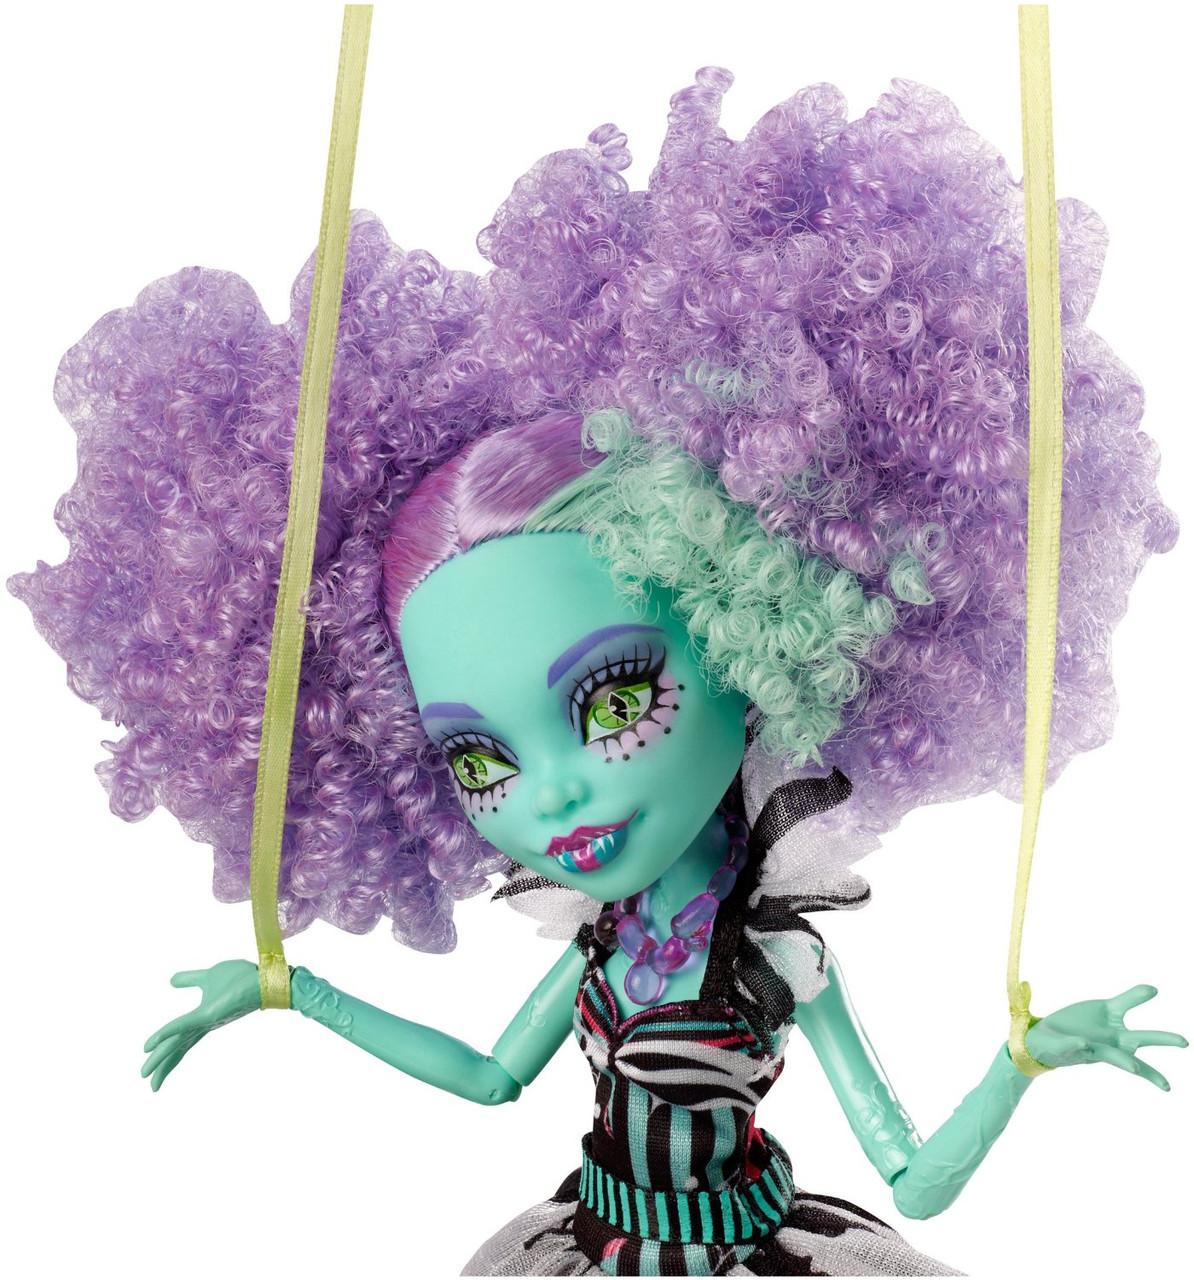 Кукла monster high Хани Свамп Фрик ду Чик Монстер Хай